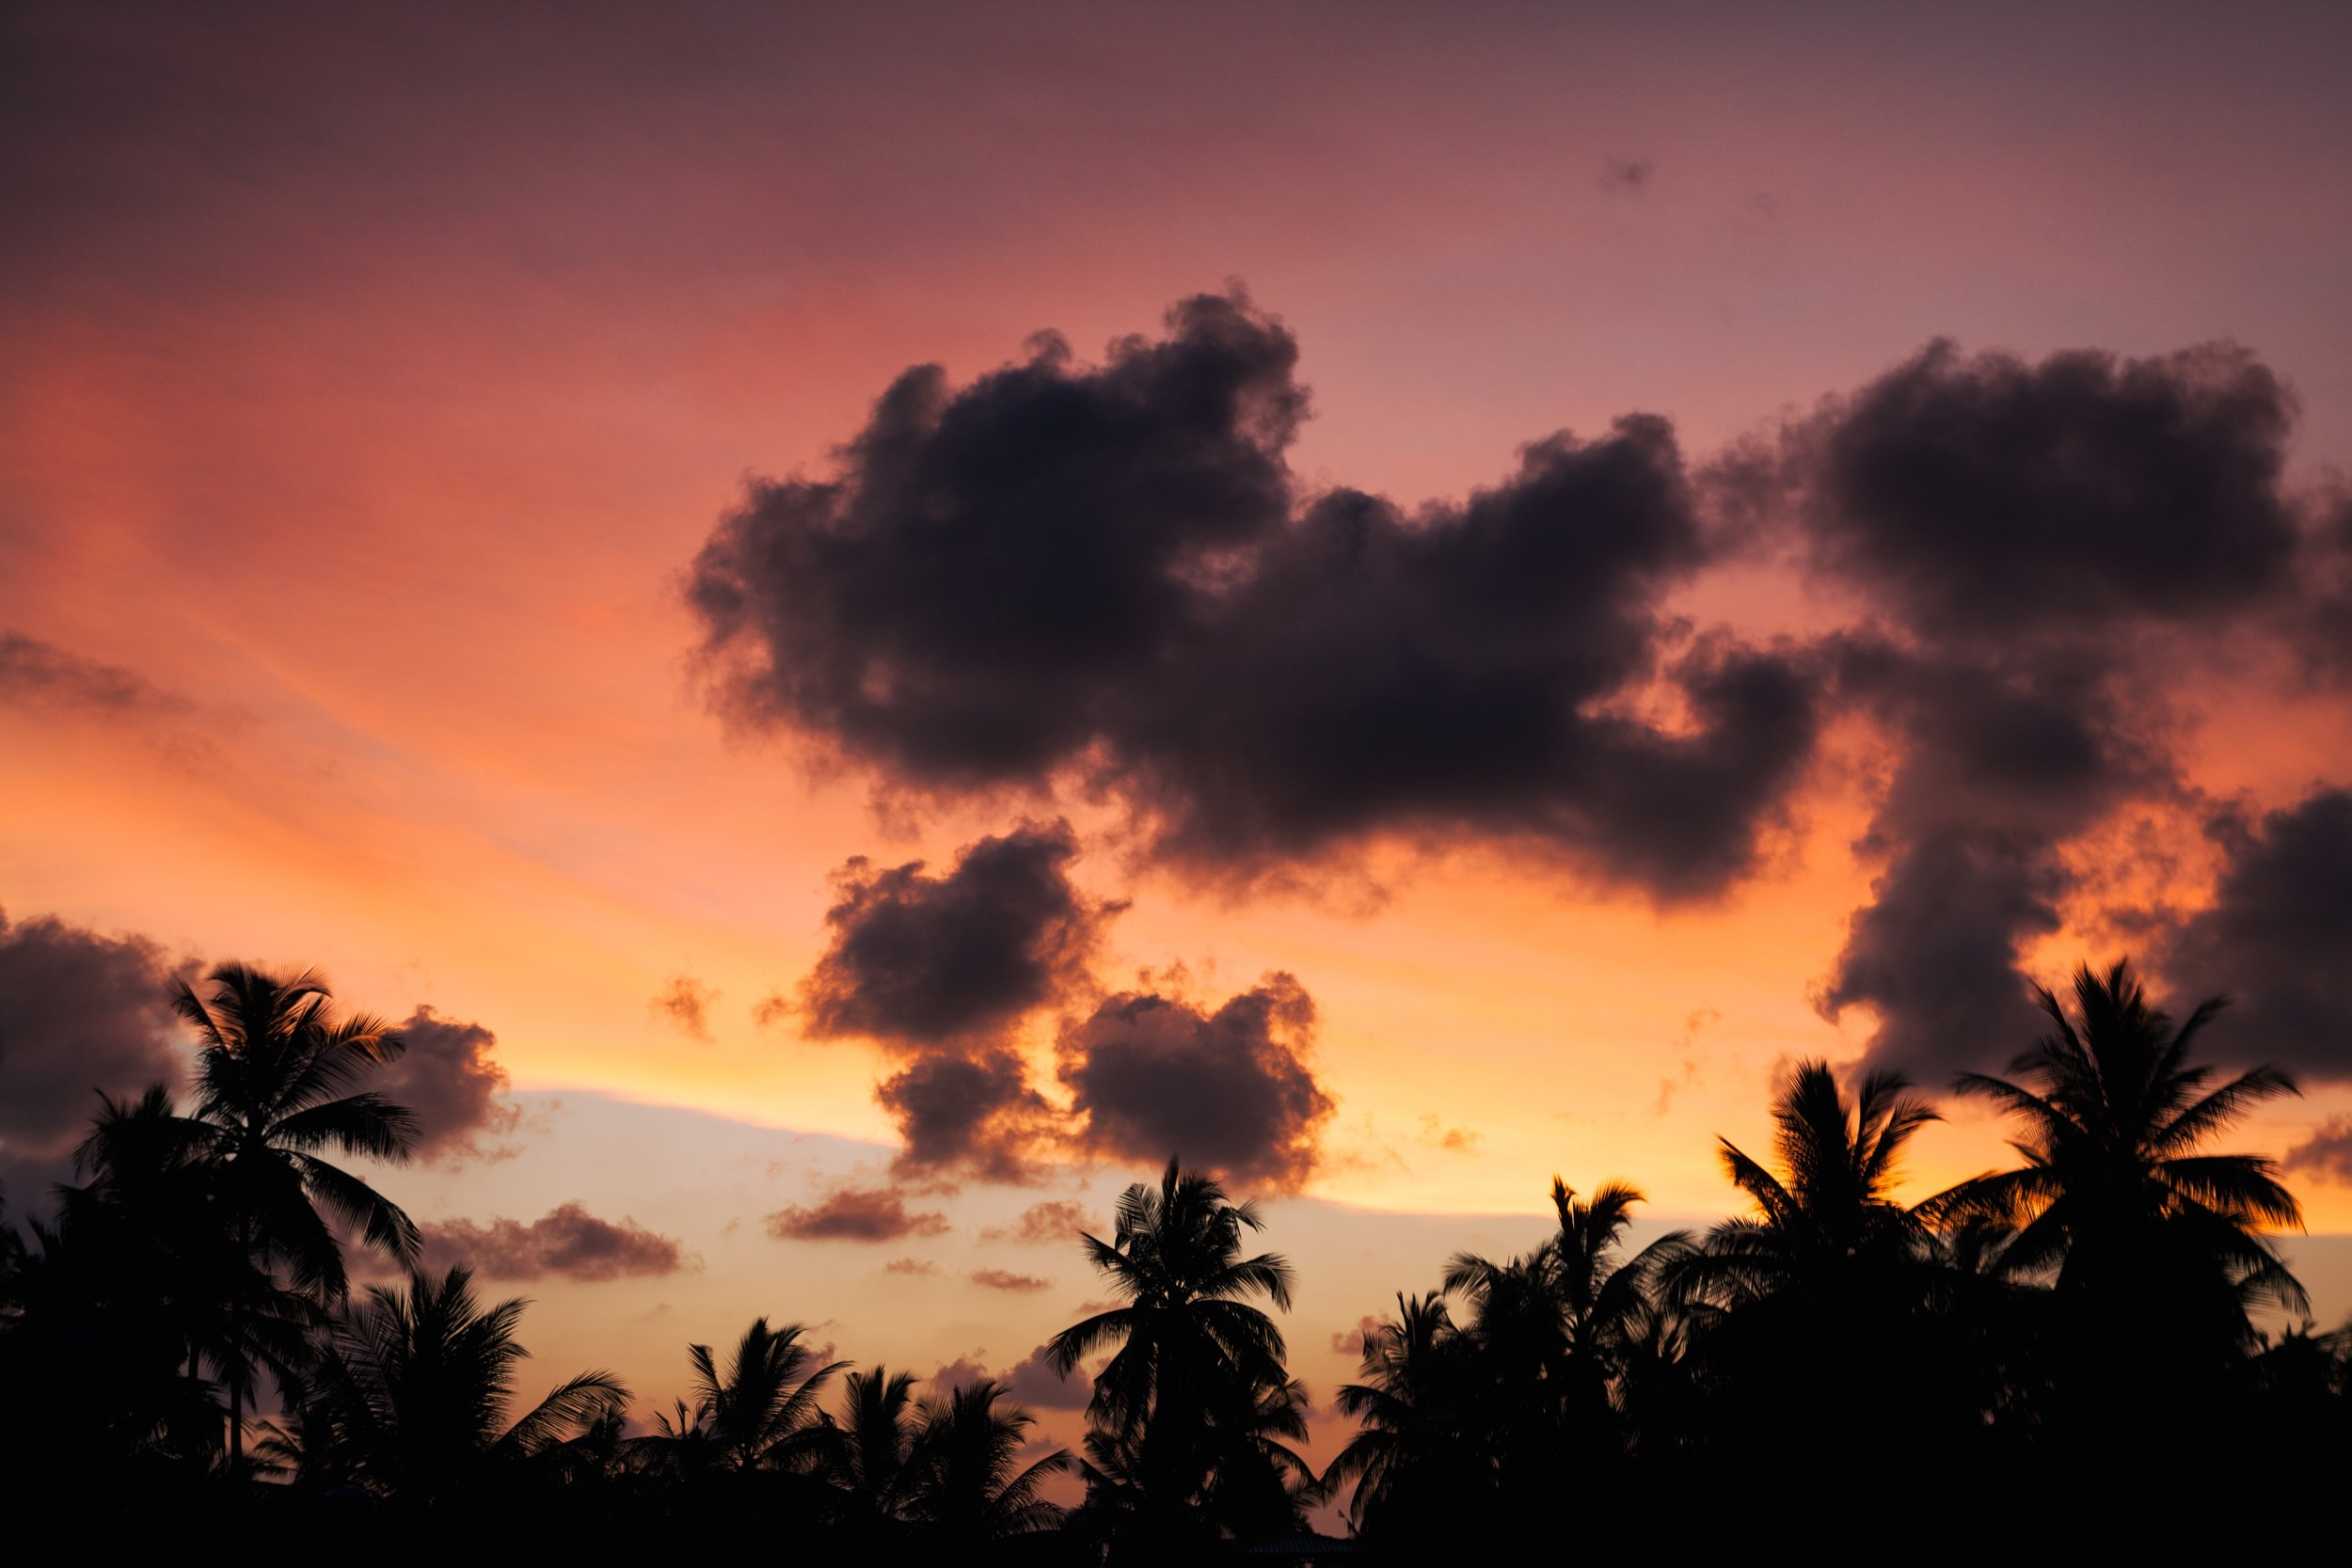 Sunset photo by Unsplash.com